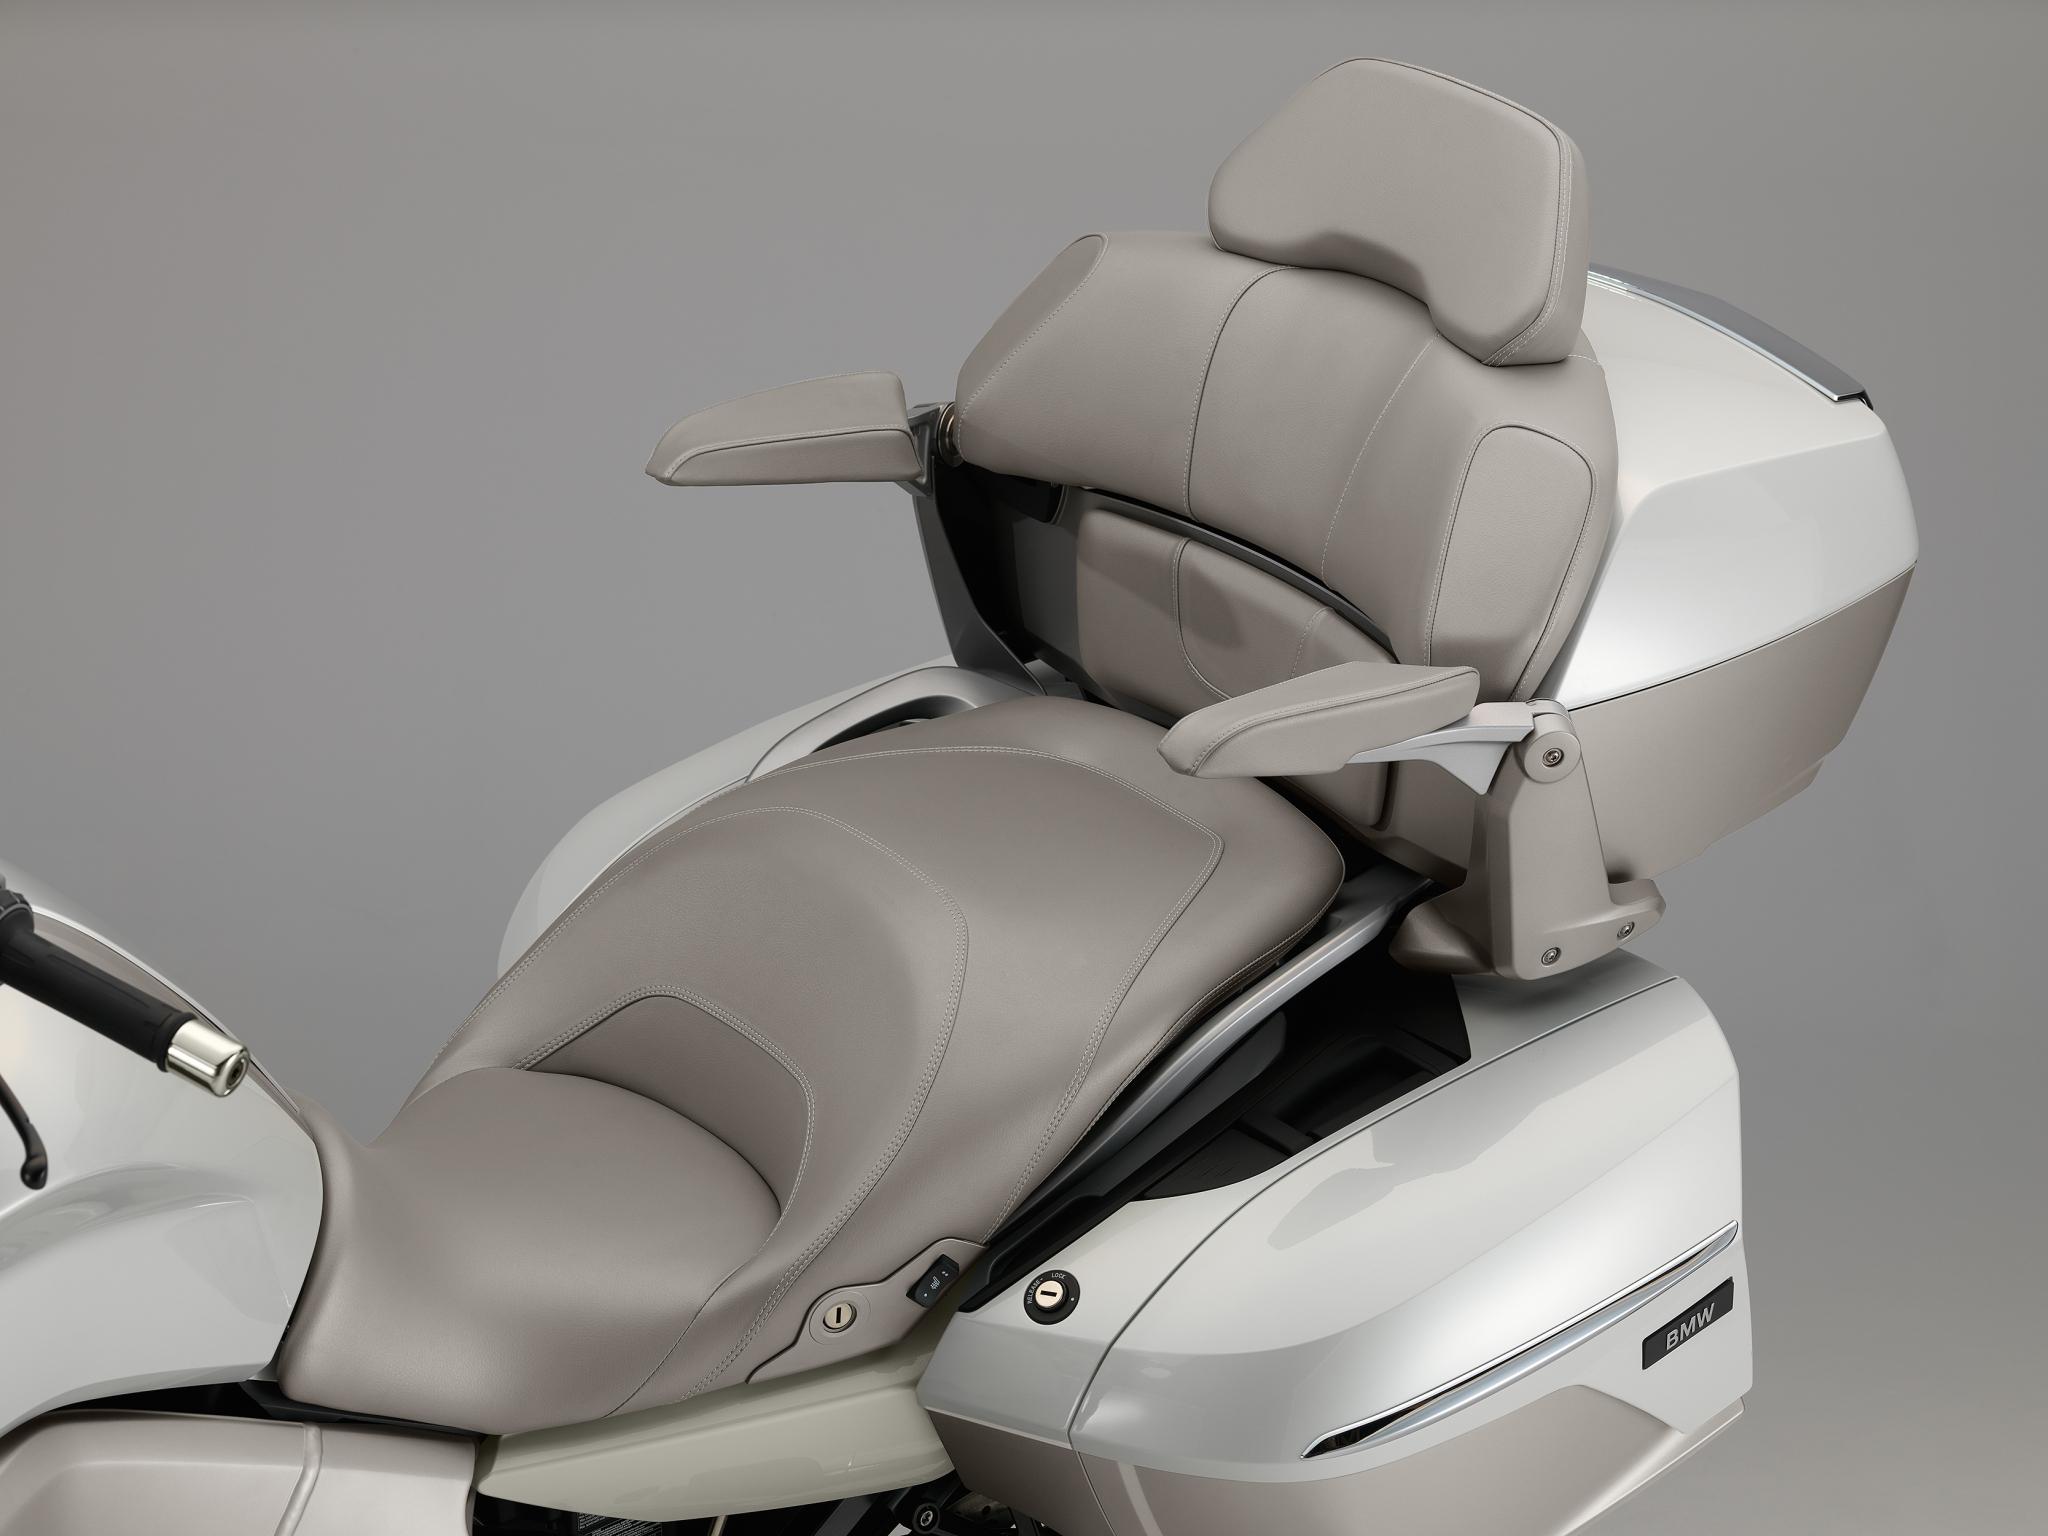 Control Arm Car >> 2014 BMW K1600GTL Exclusive Official Pictures - autoevolution